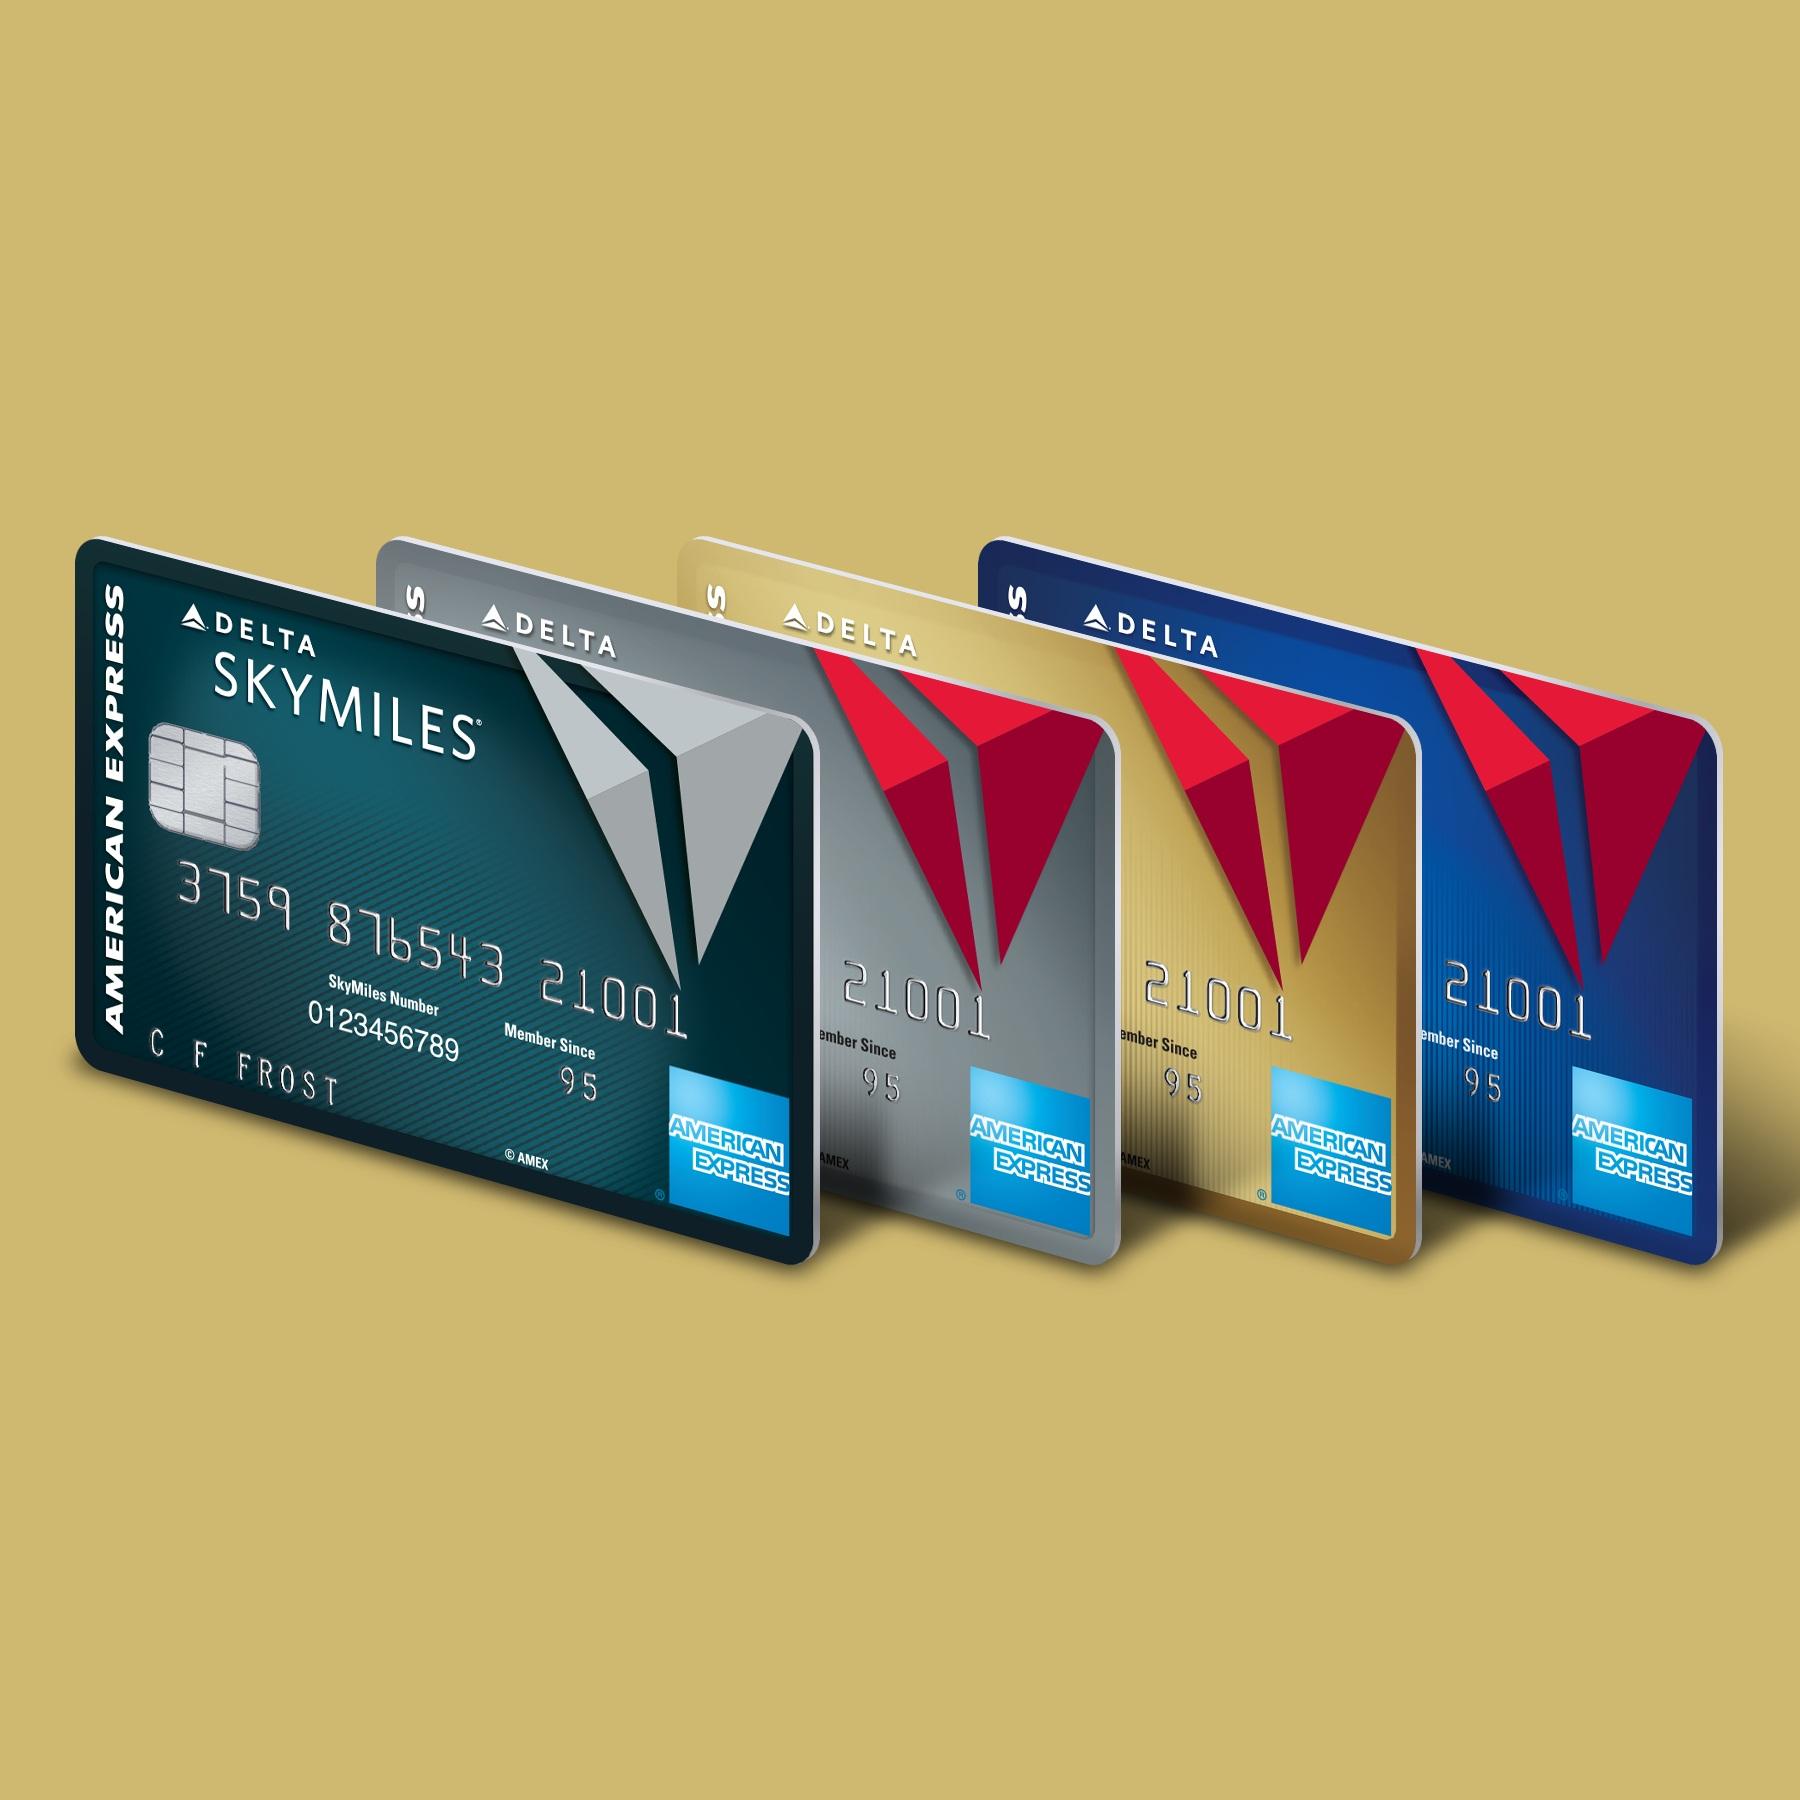 DELTA | Credit Card Launch